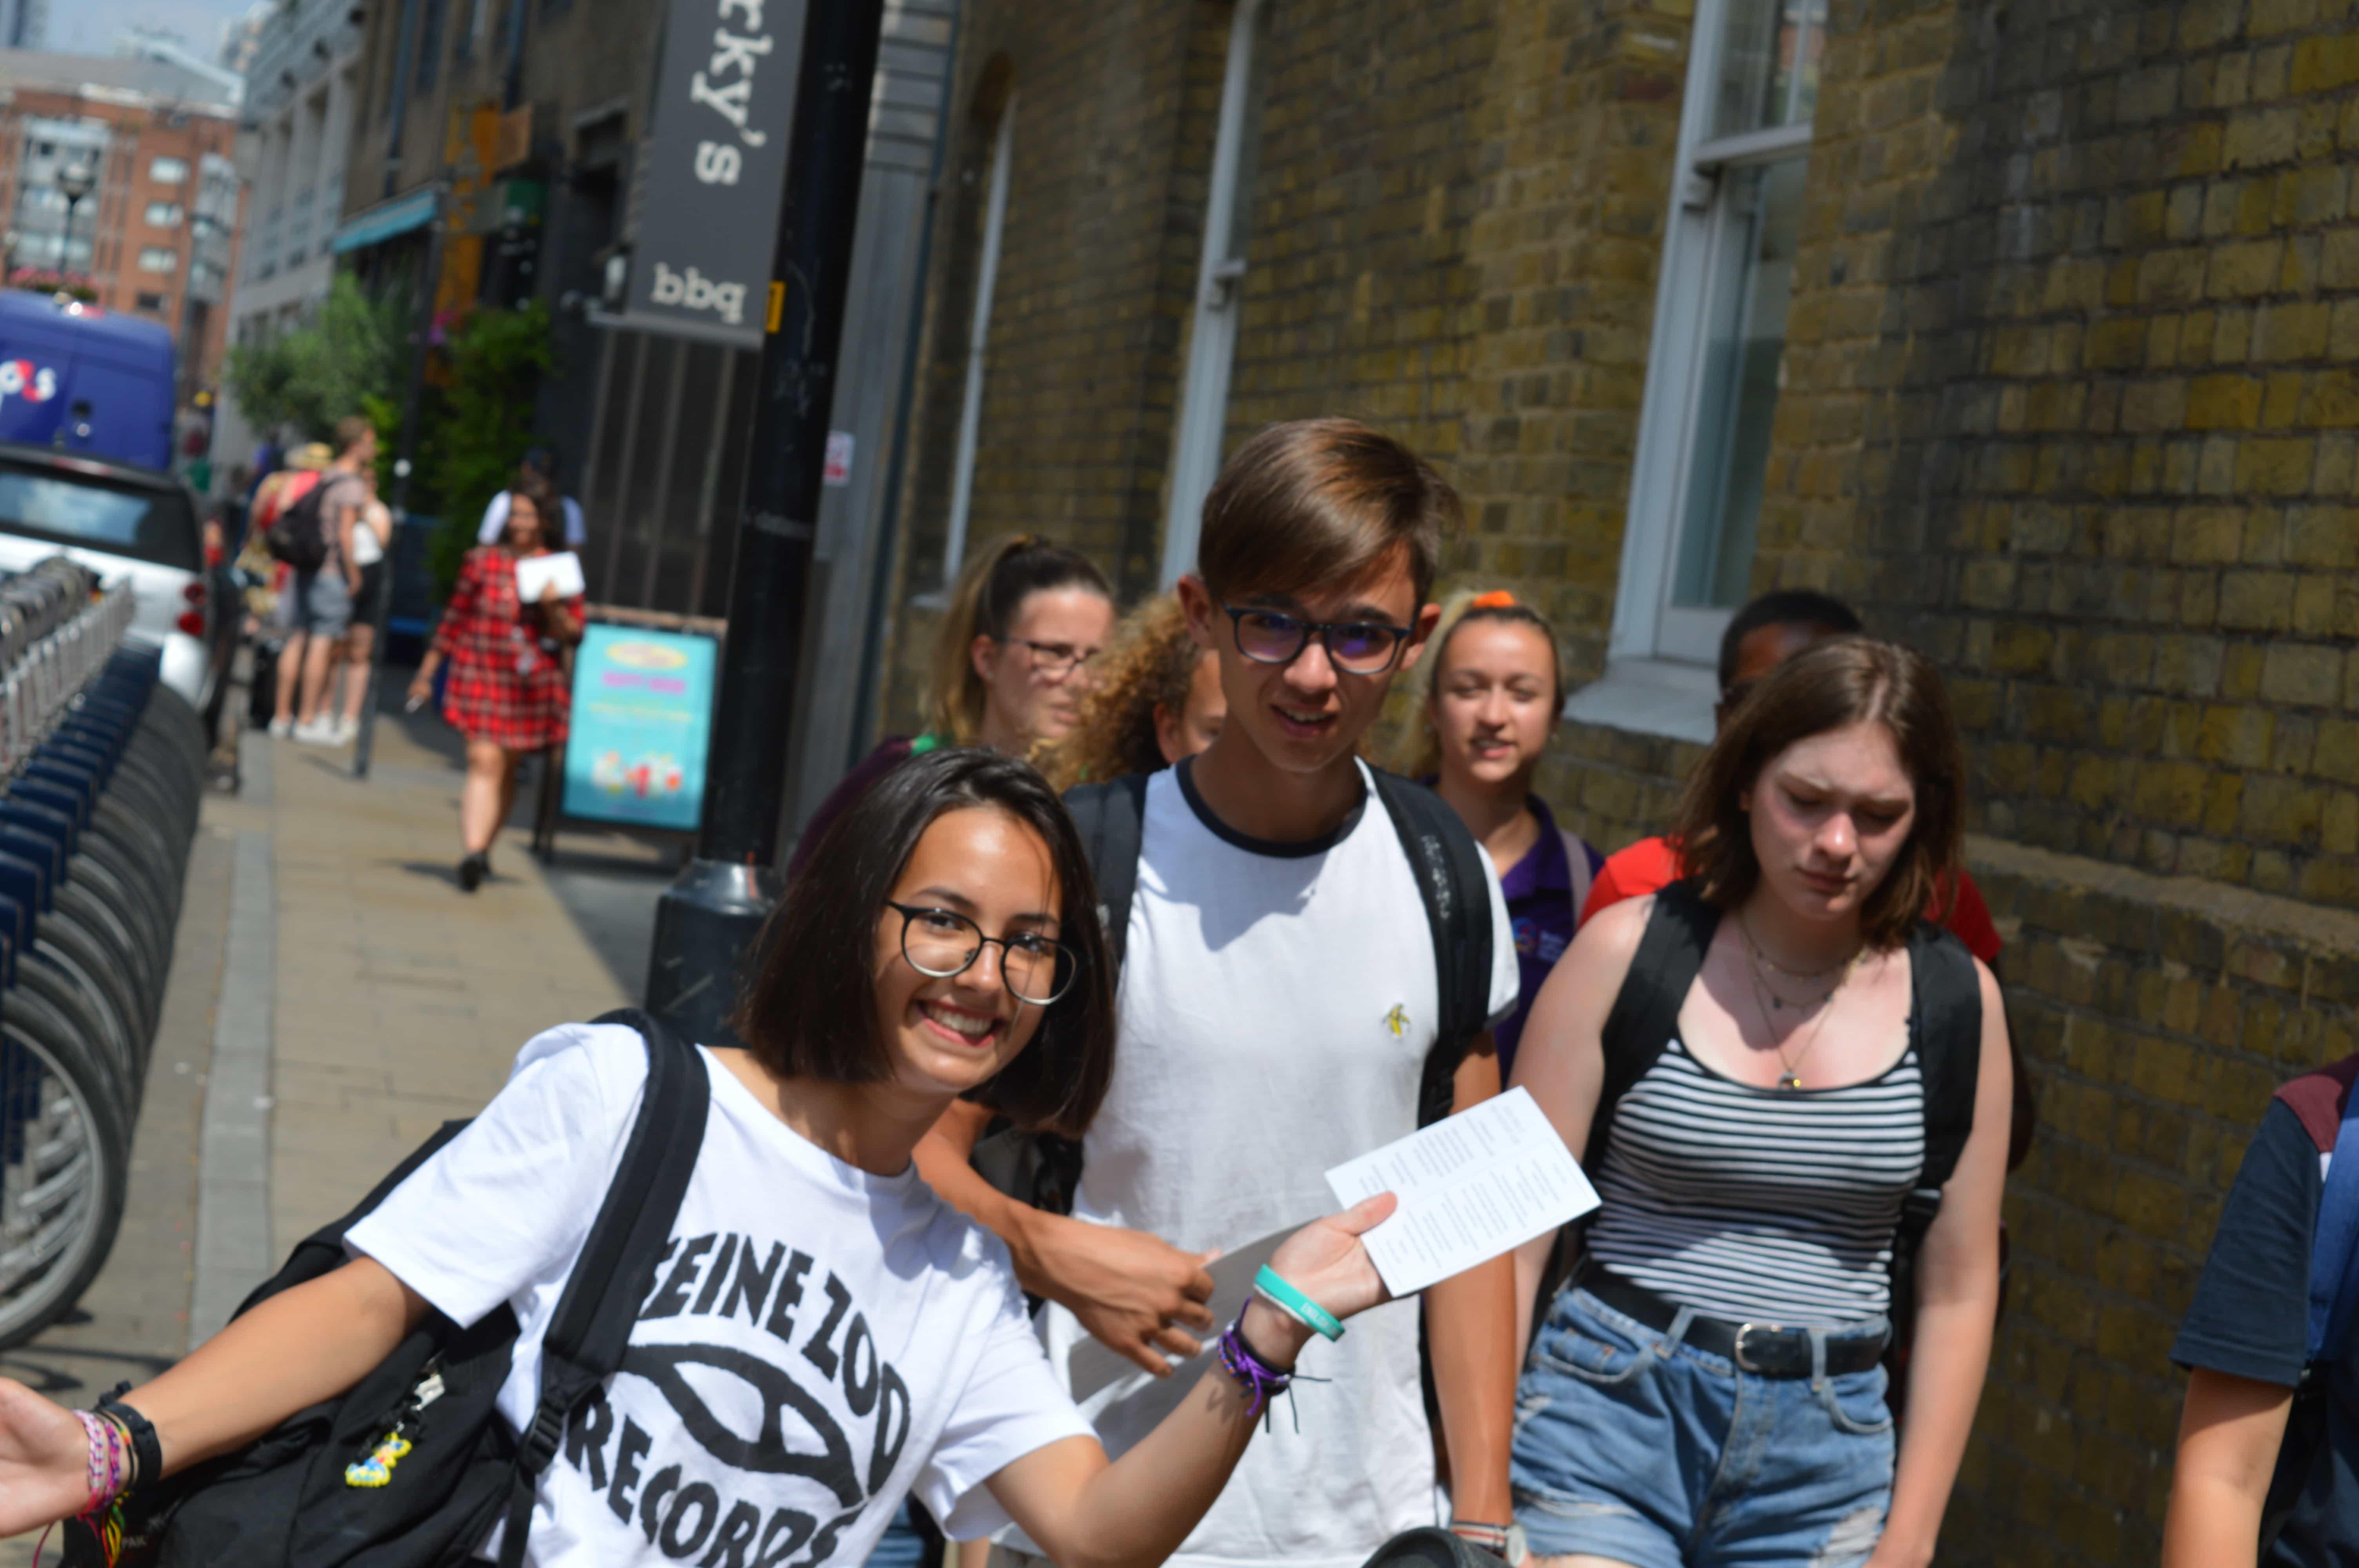 Enjoy English summer school in the UK